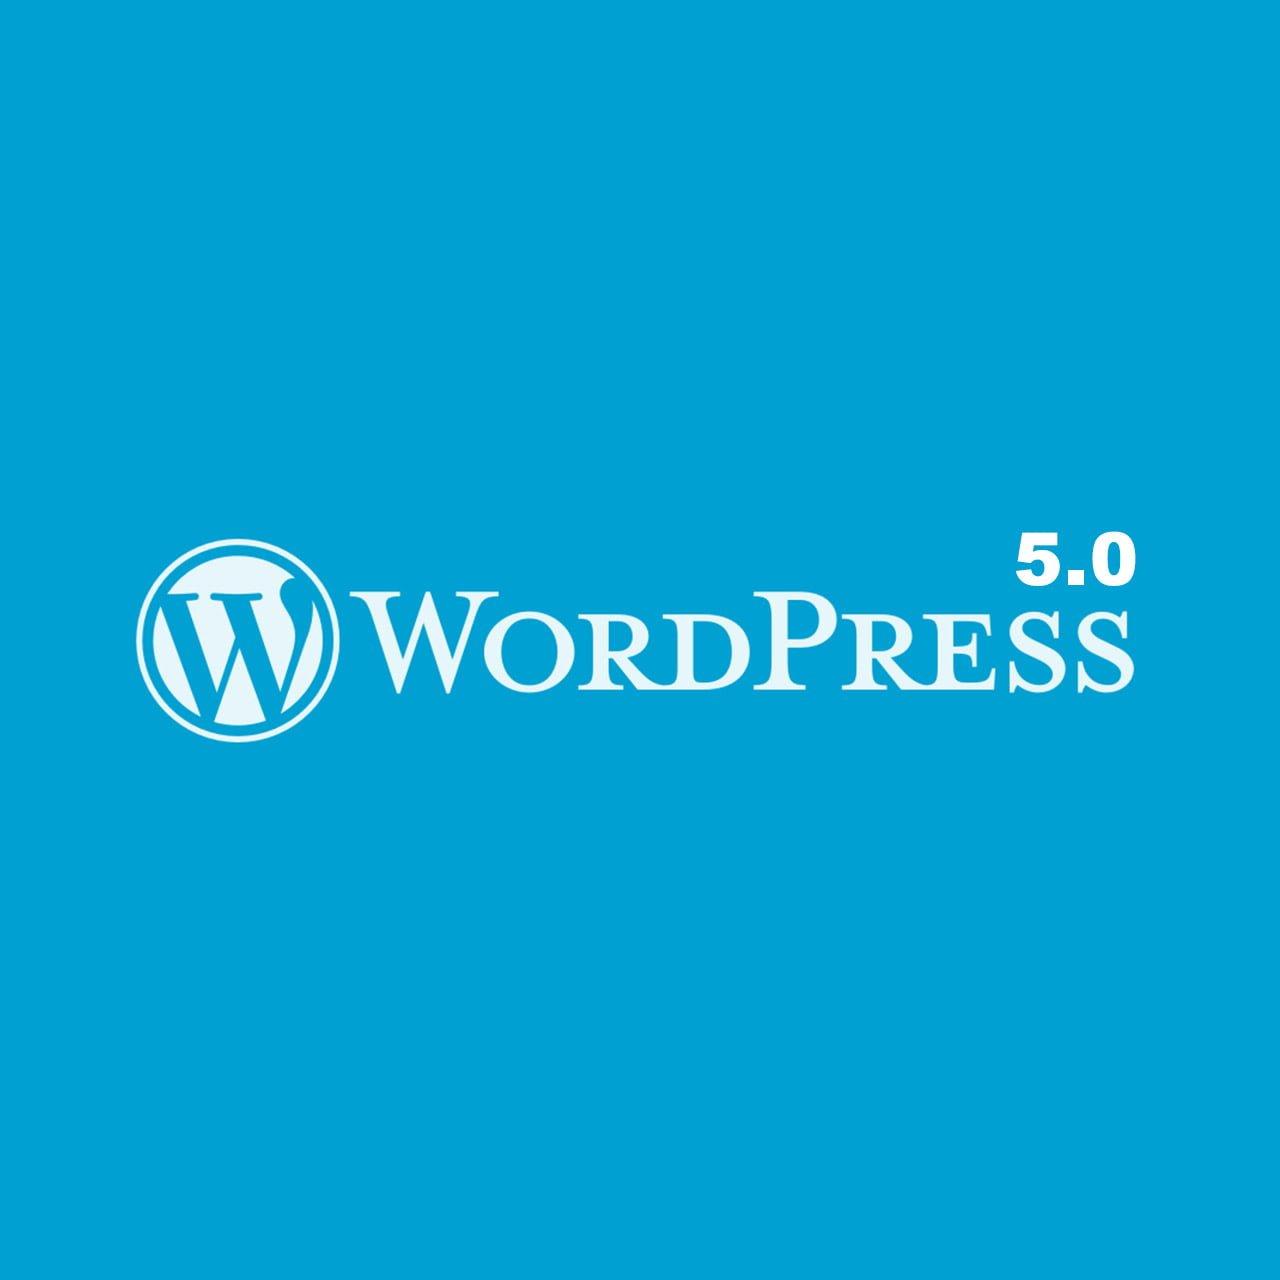 wordpress-5.0-data-rilascio